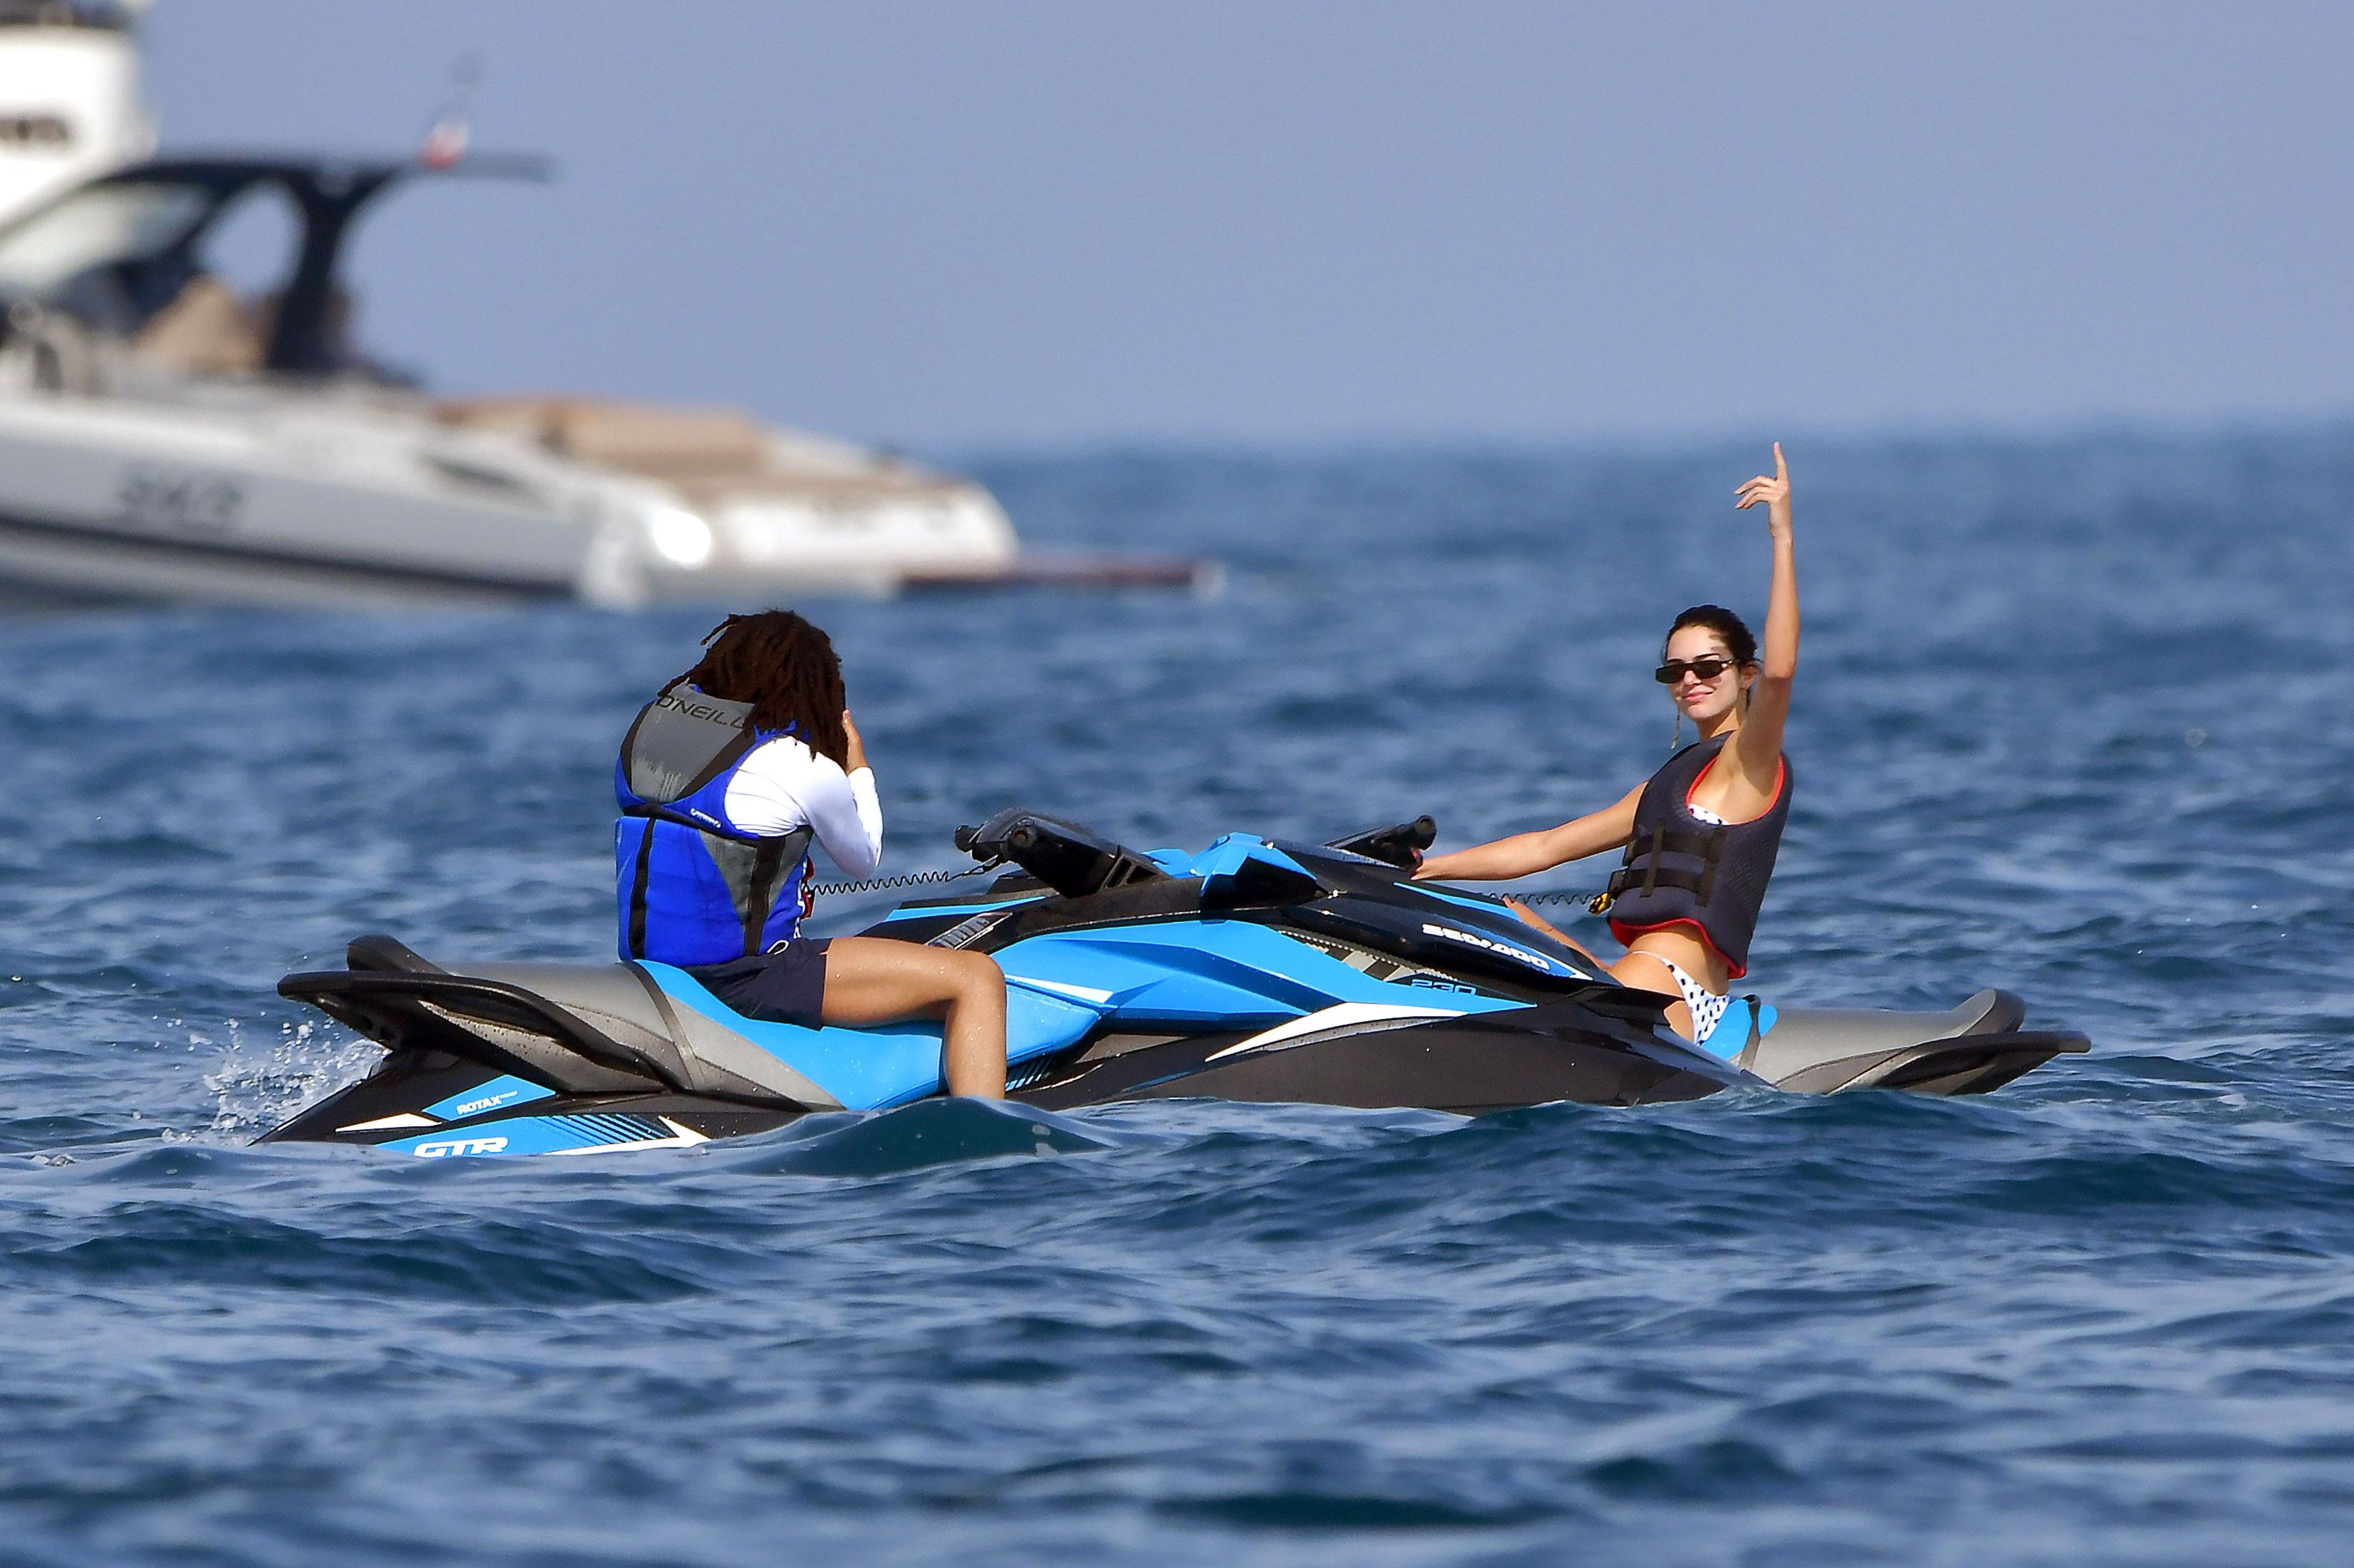 Newly Single Kendall Jenner Hangs Out With Kourtney Kardashian's Ex-Fling Luka Sabbat in Monaco